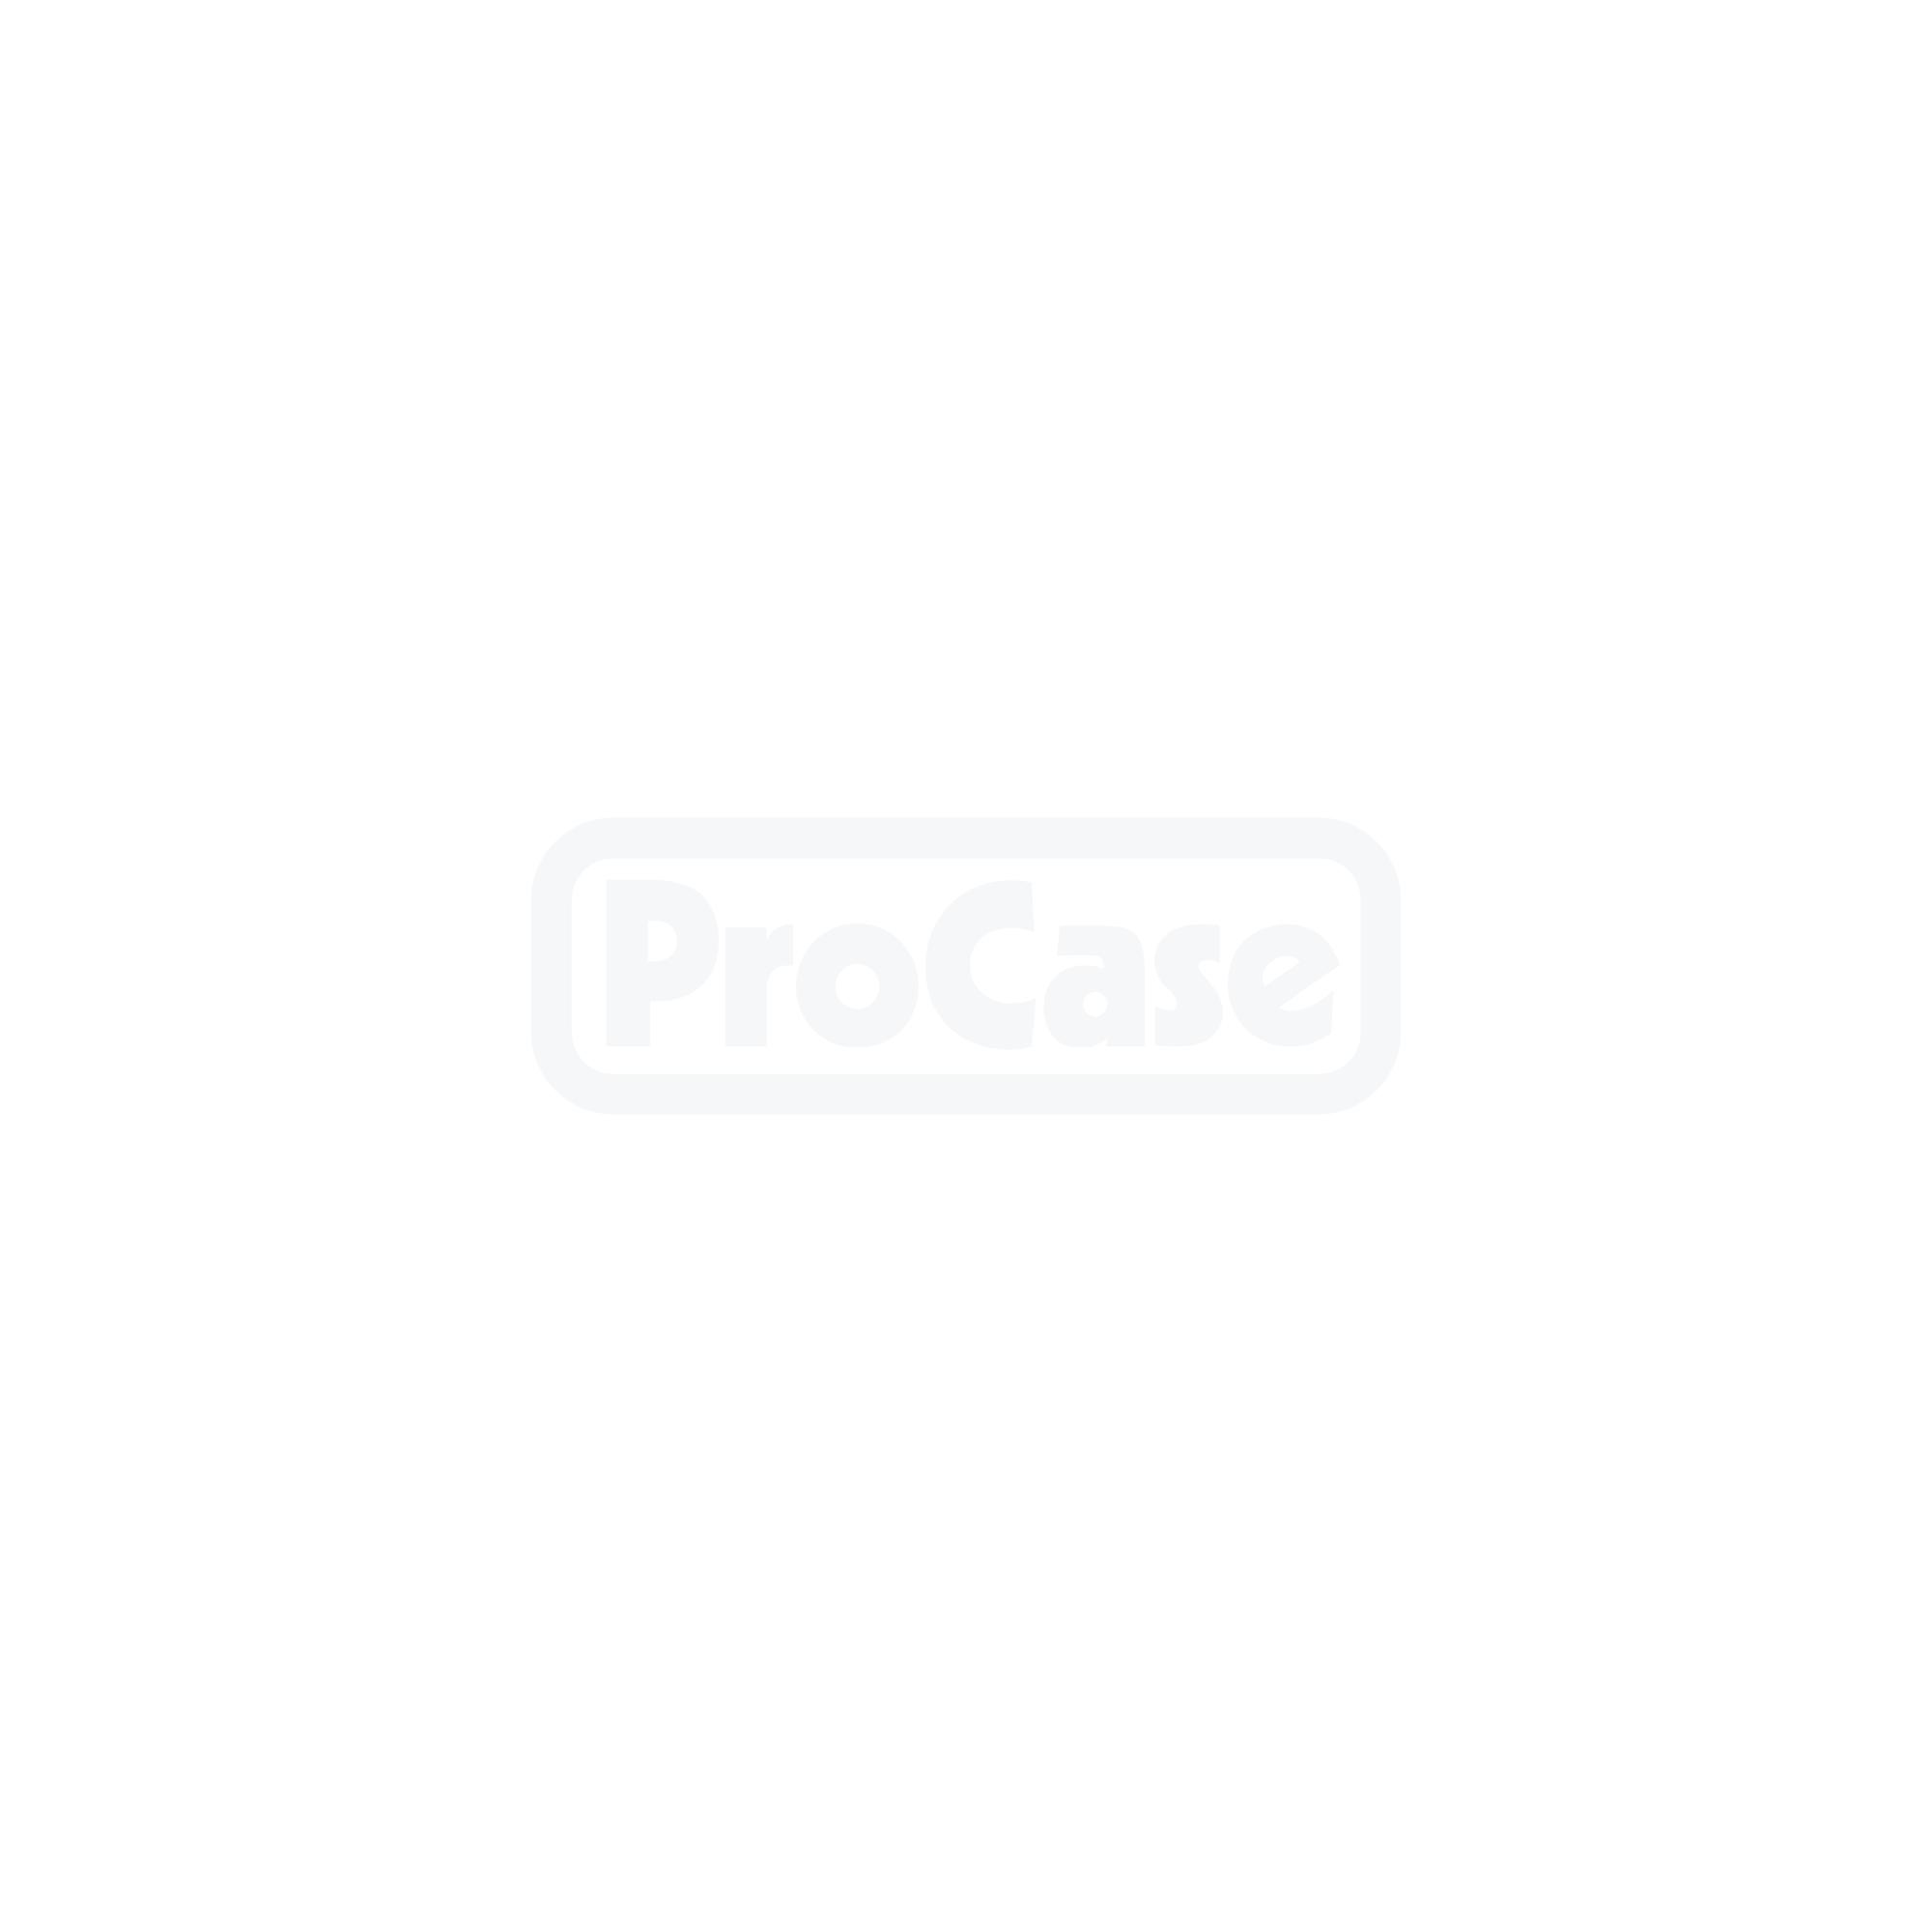 Flightcase für 3x LG 32LN5406 LED-TV 2